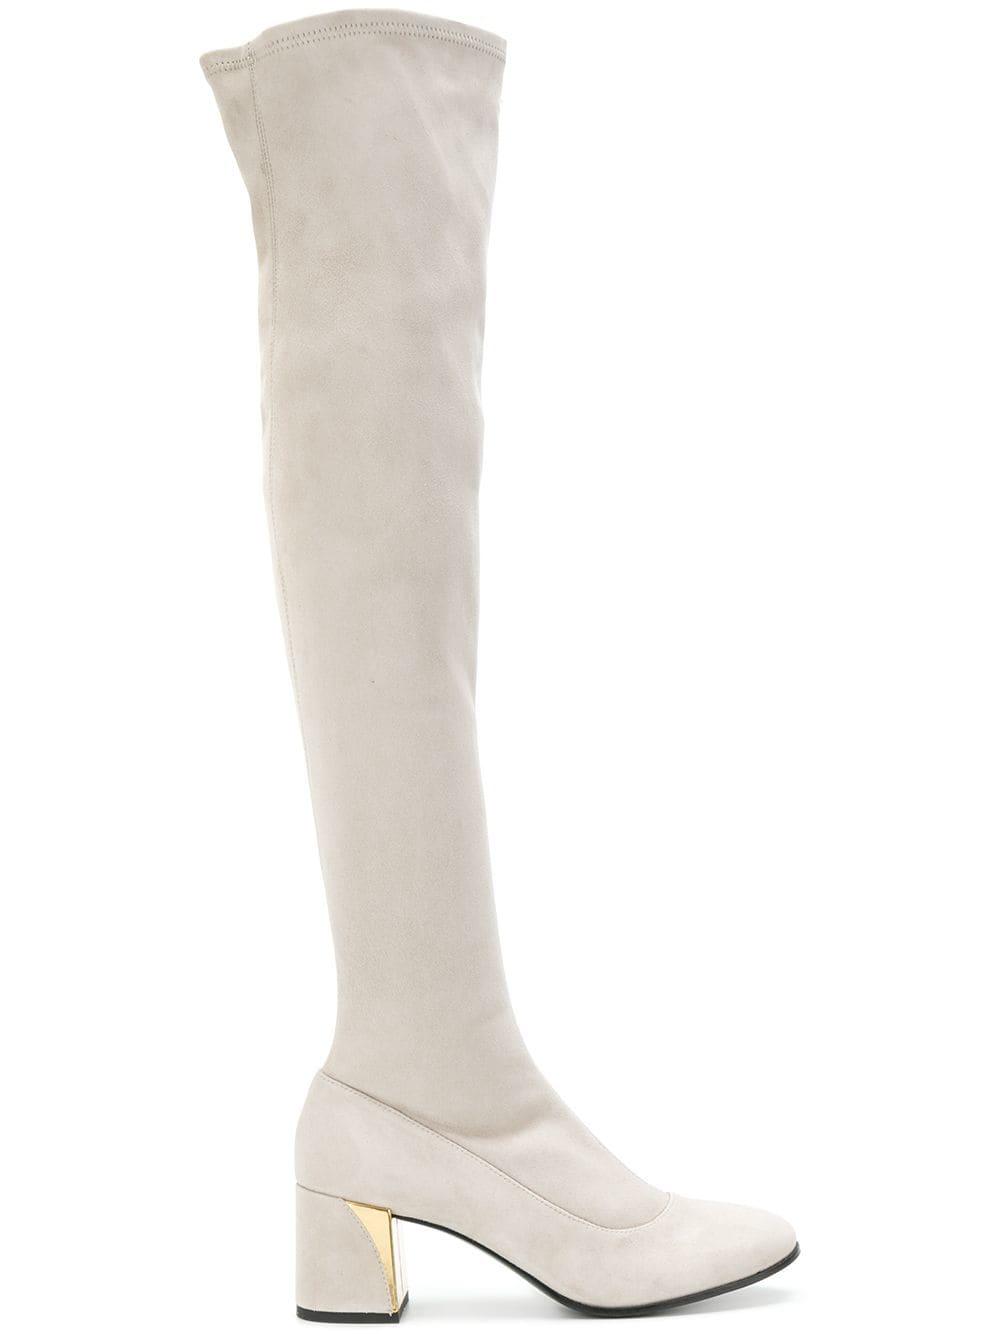 Fabi Overknee-Stiefel aus Wildleder - Grau